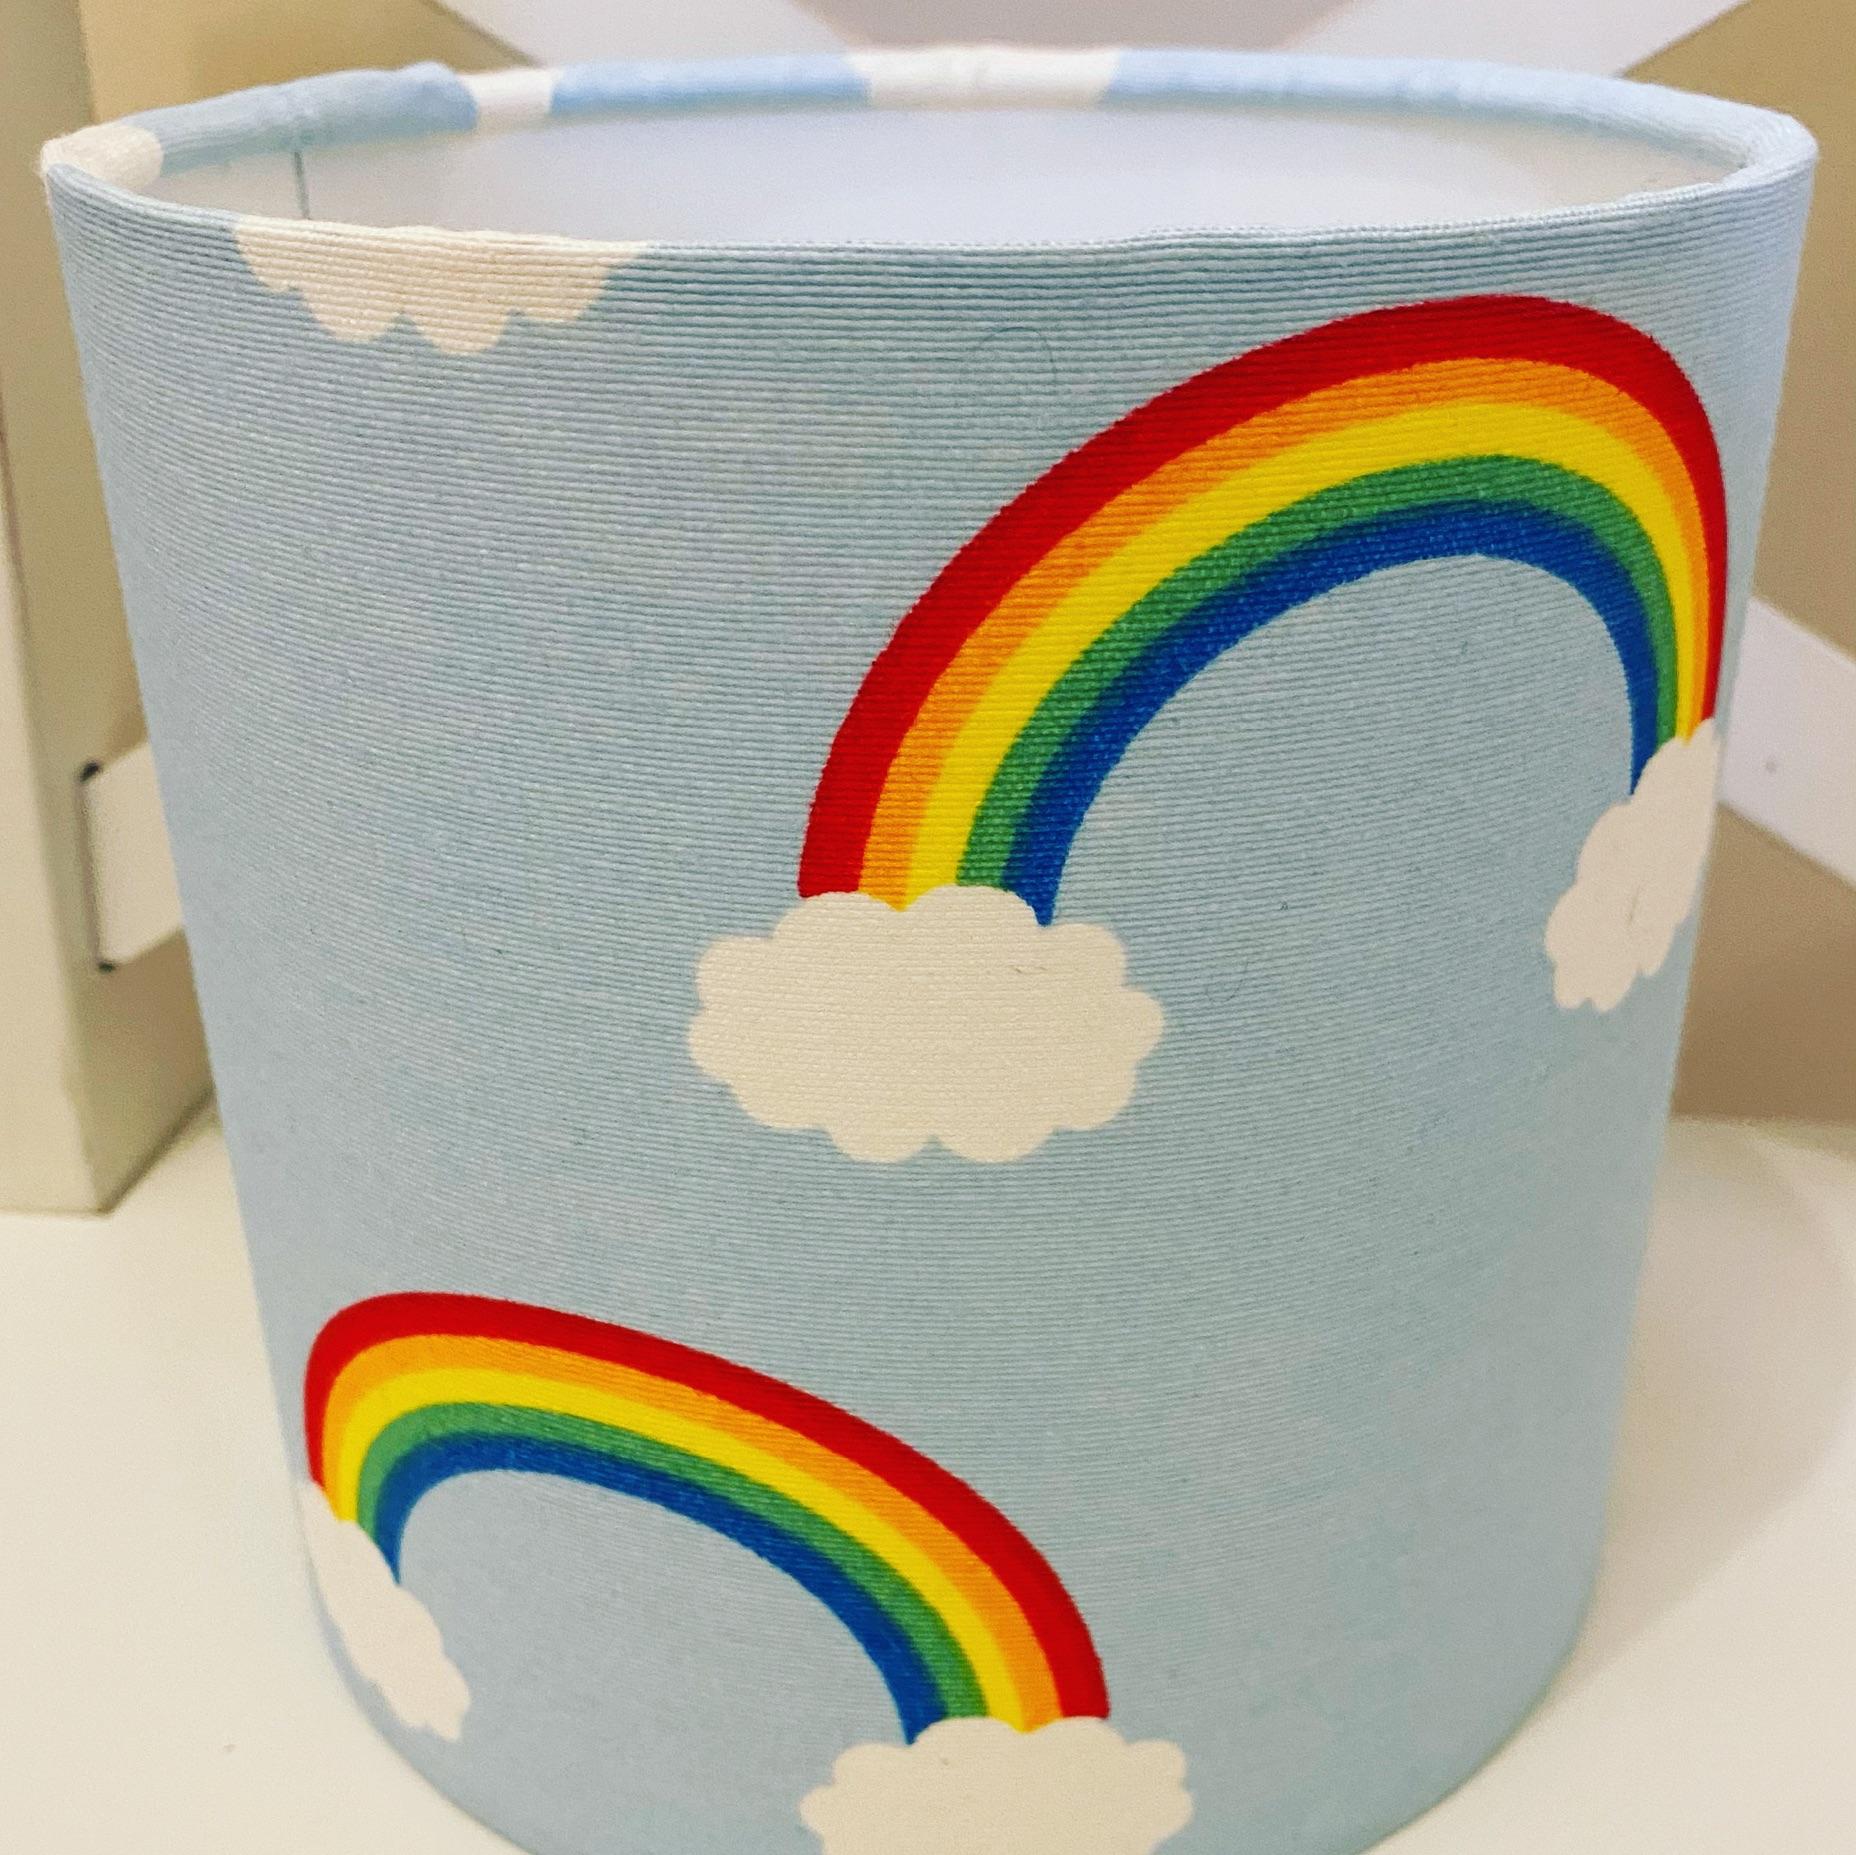 LBGT rainbow lamp